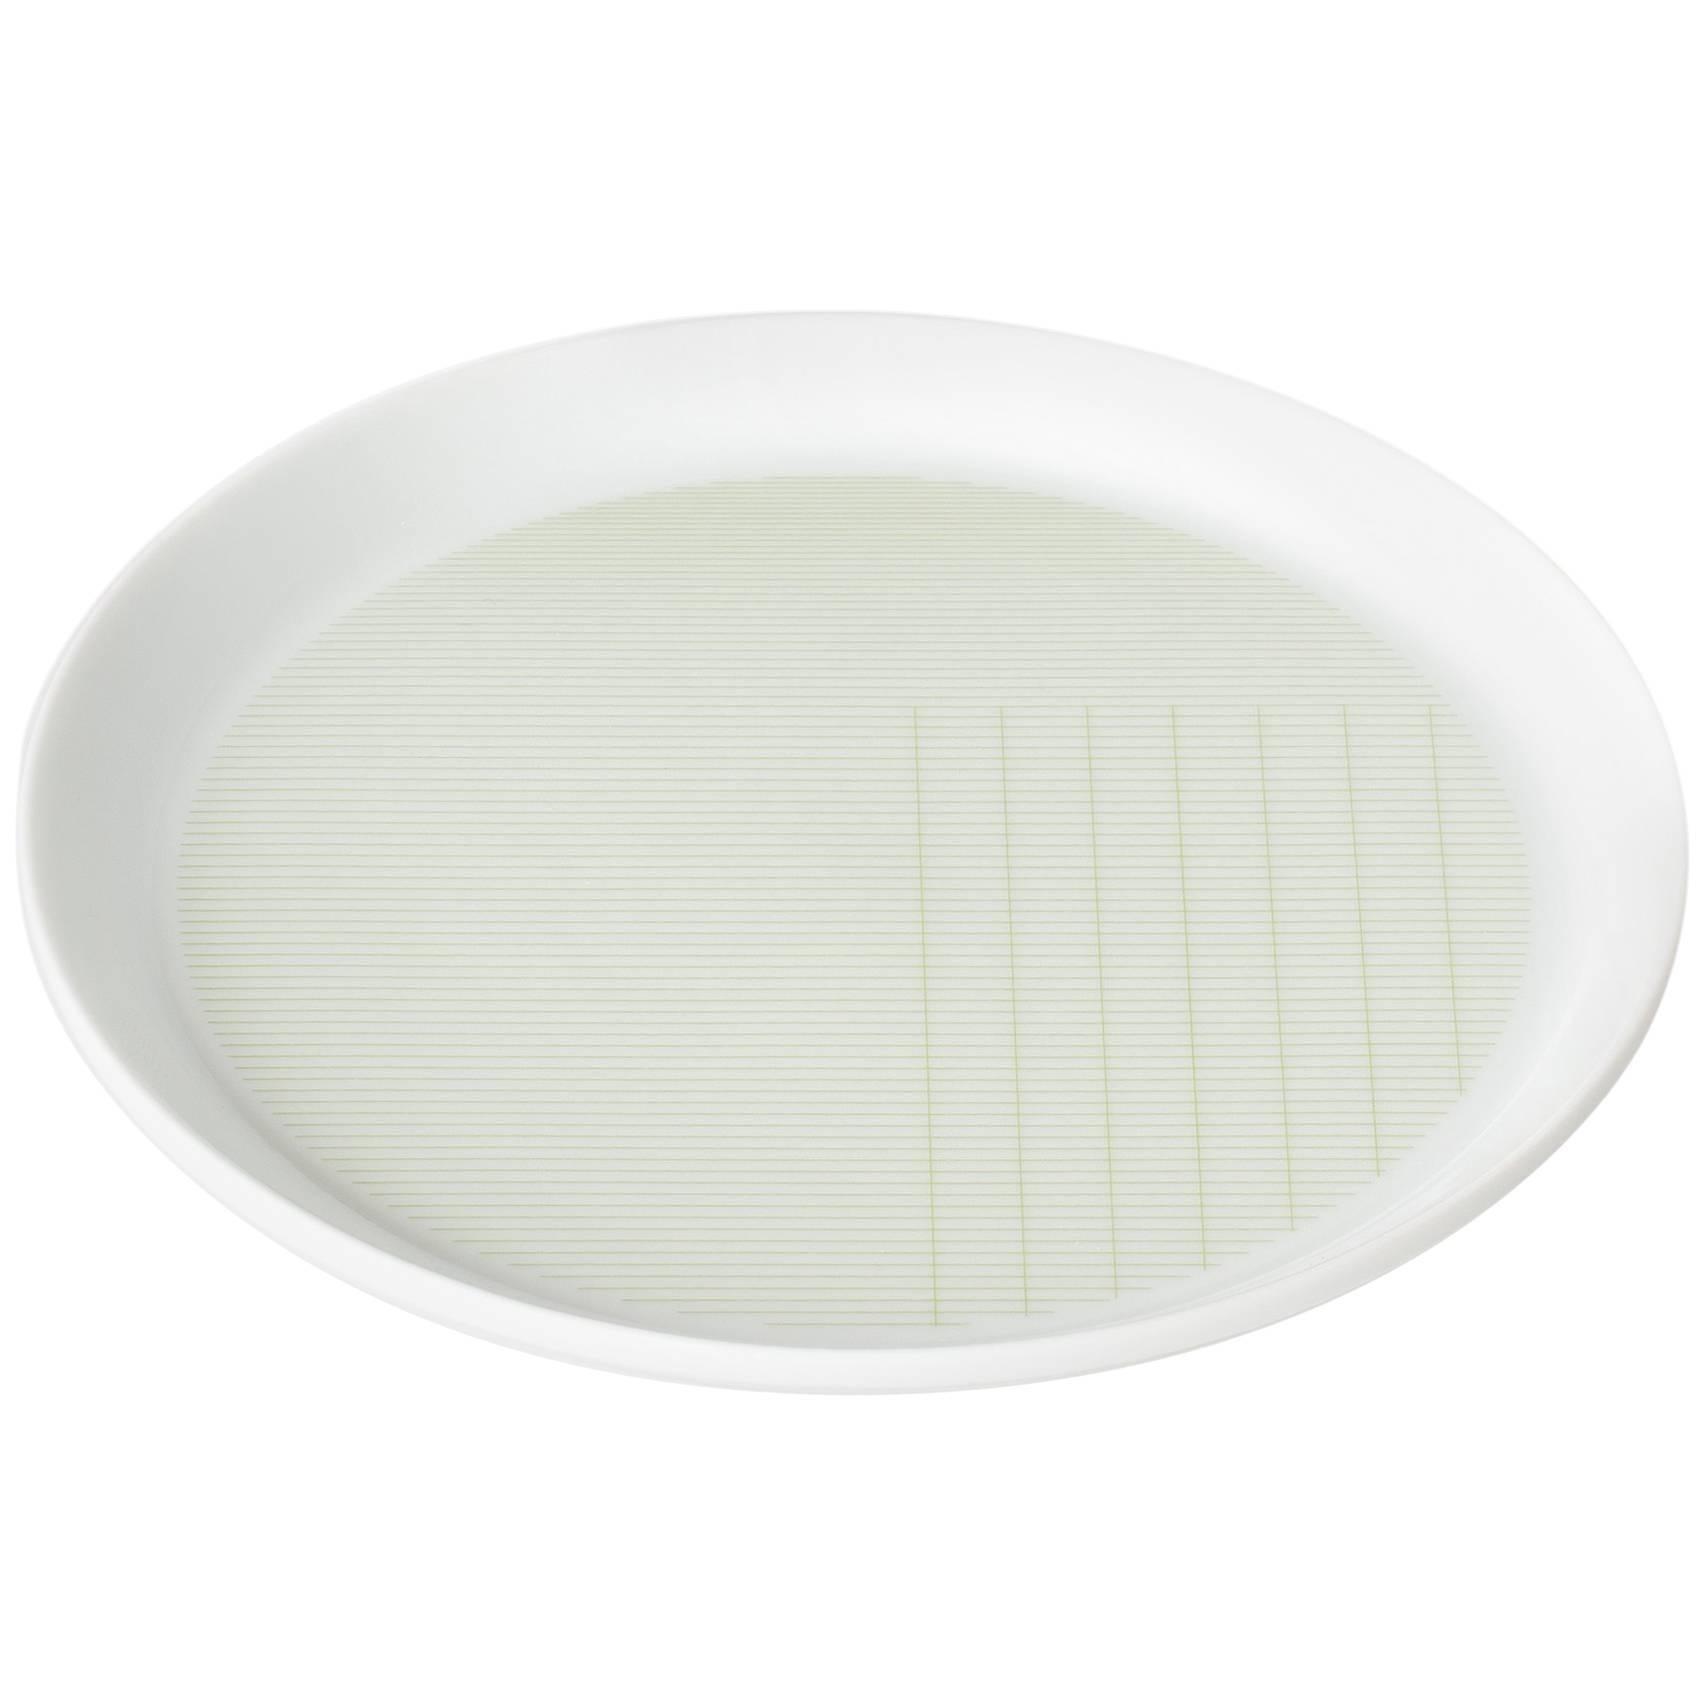 Maharam Pattern Porcelain Plate Small by Scholten & Baijings